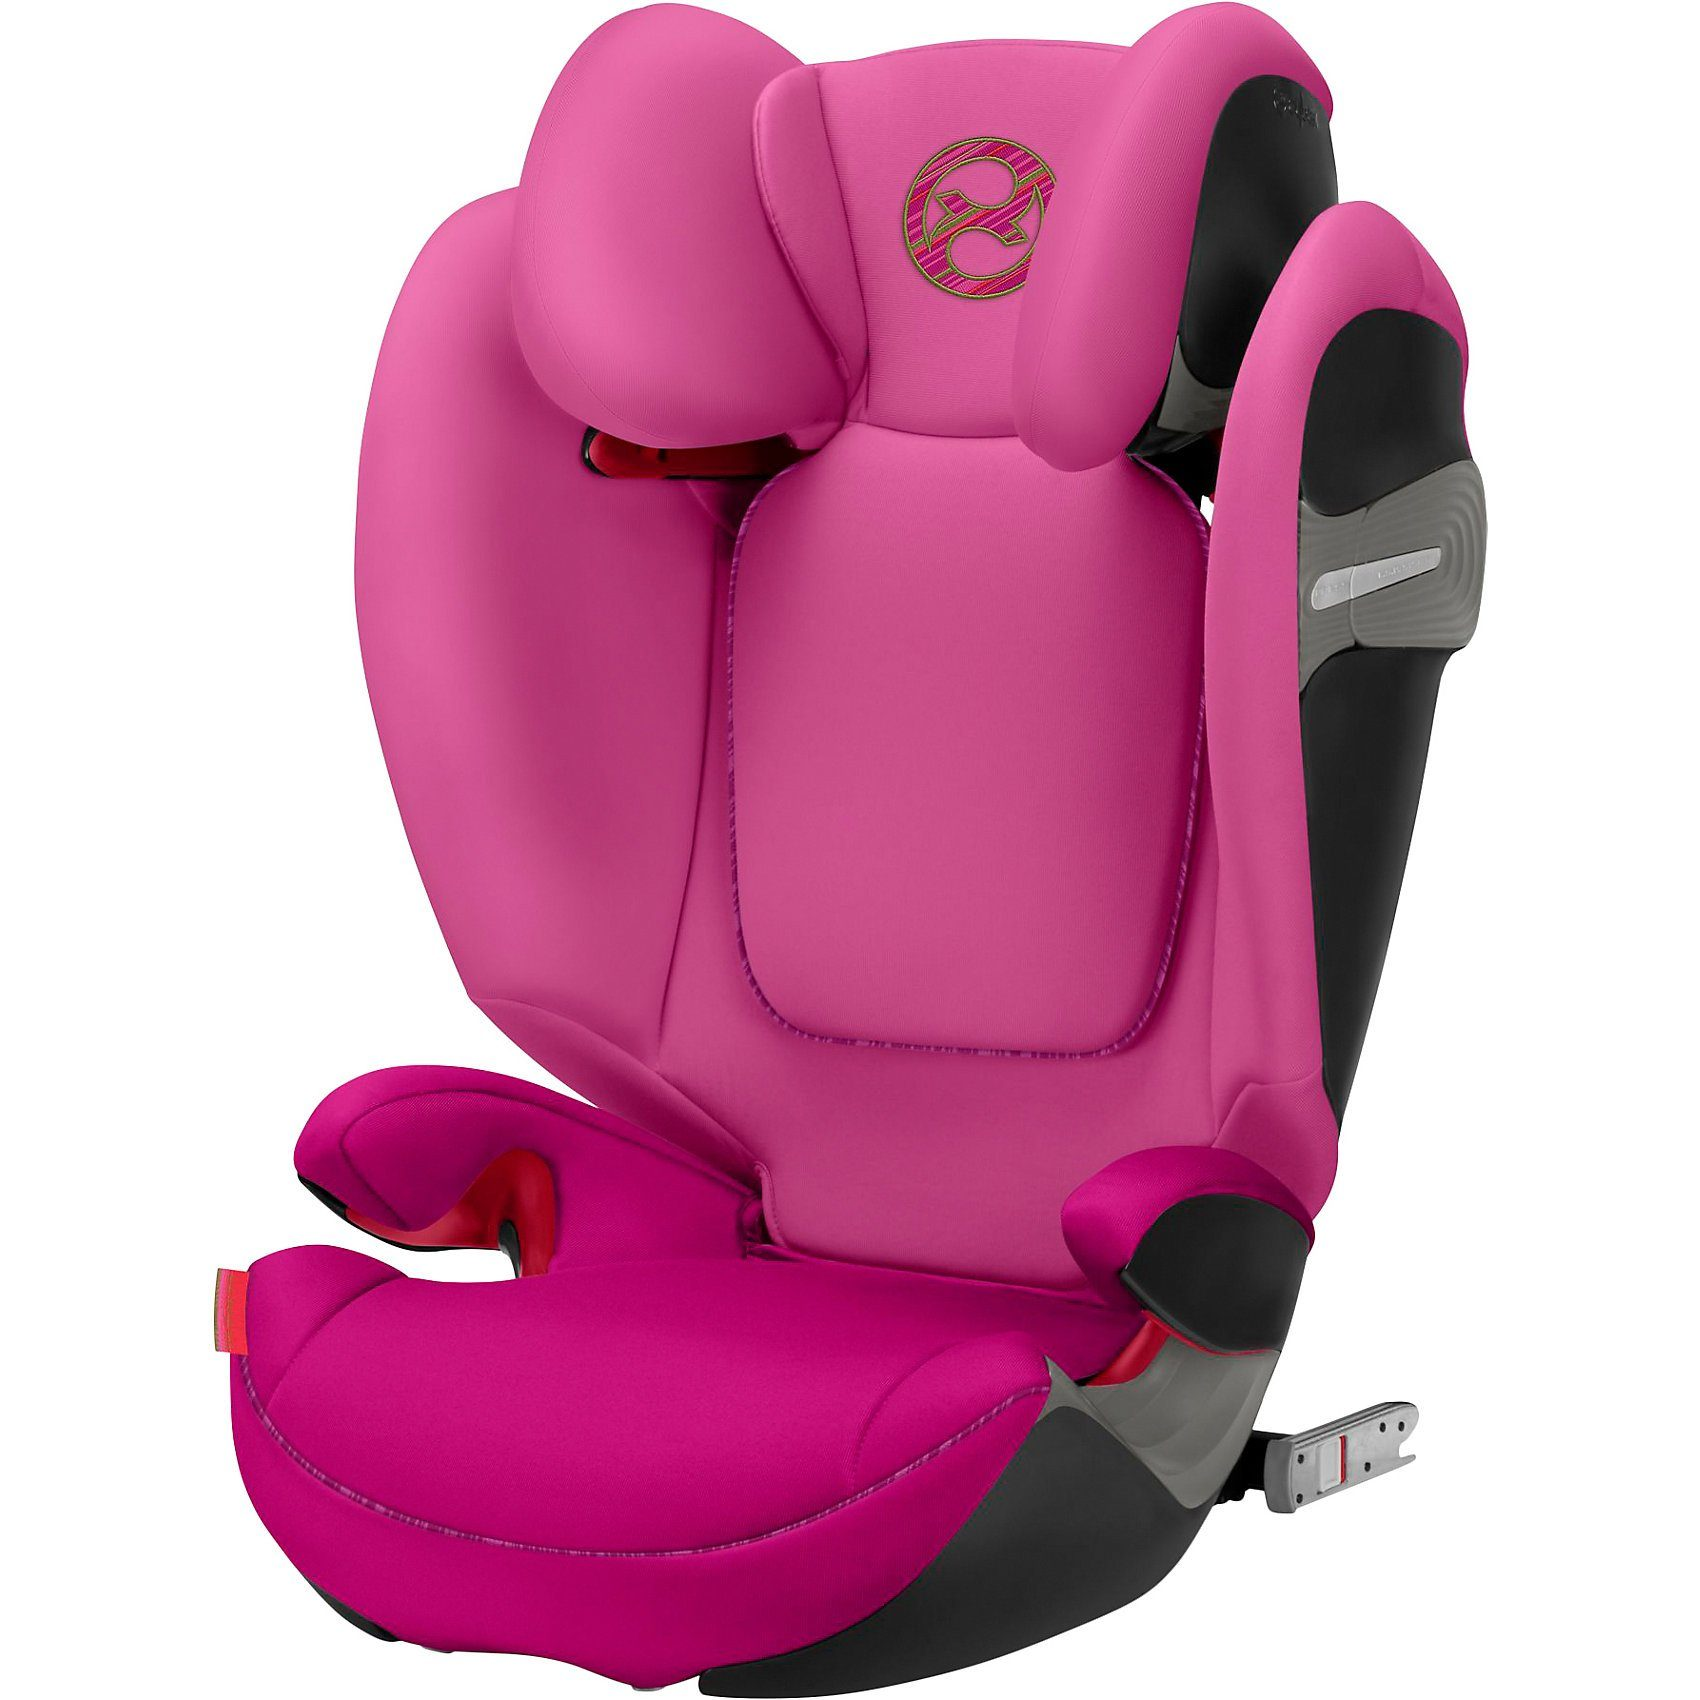 Cybex Auto-Kindersitz Solution S-Fix, Gold-Line, Fancy Pink, 2019